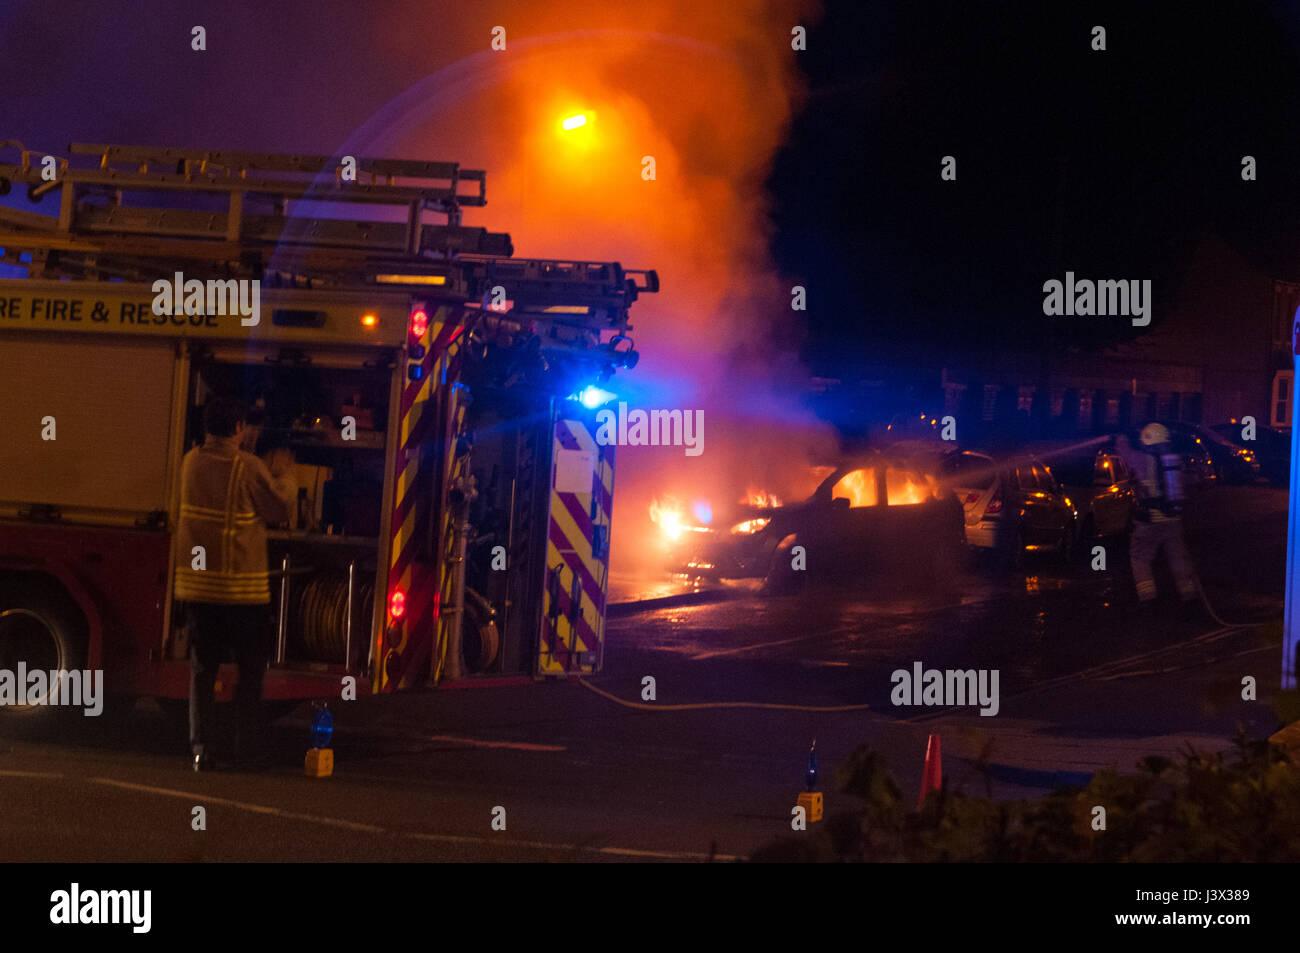 Oxford, Oxfordshire, UK. 7th May 2017, Car on fire on Iffley Road. Credit: Stanislav Halcin/Alamy Live News Stock Photo